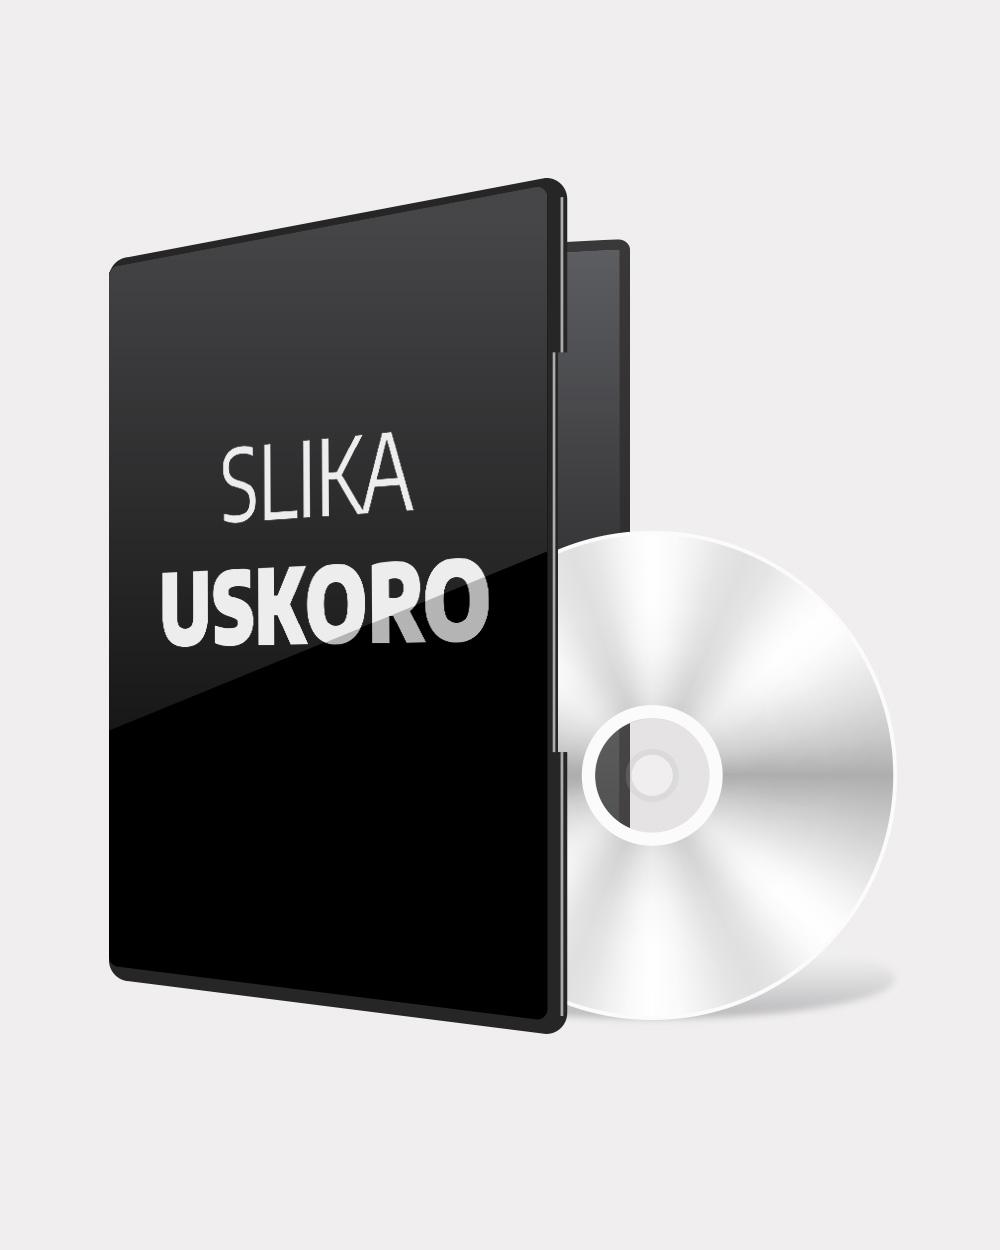 Tastatura Trust Nado bežična bluetooth